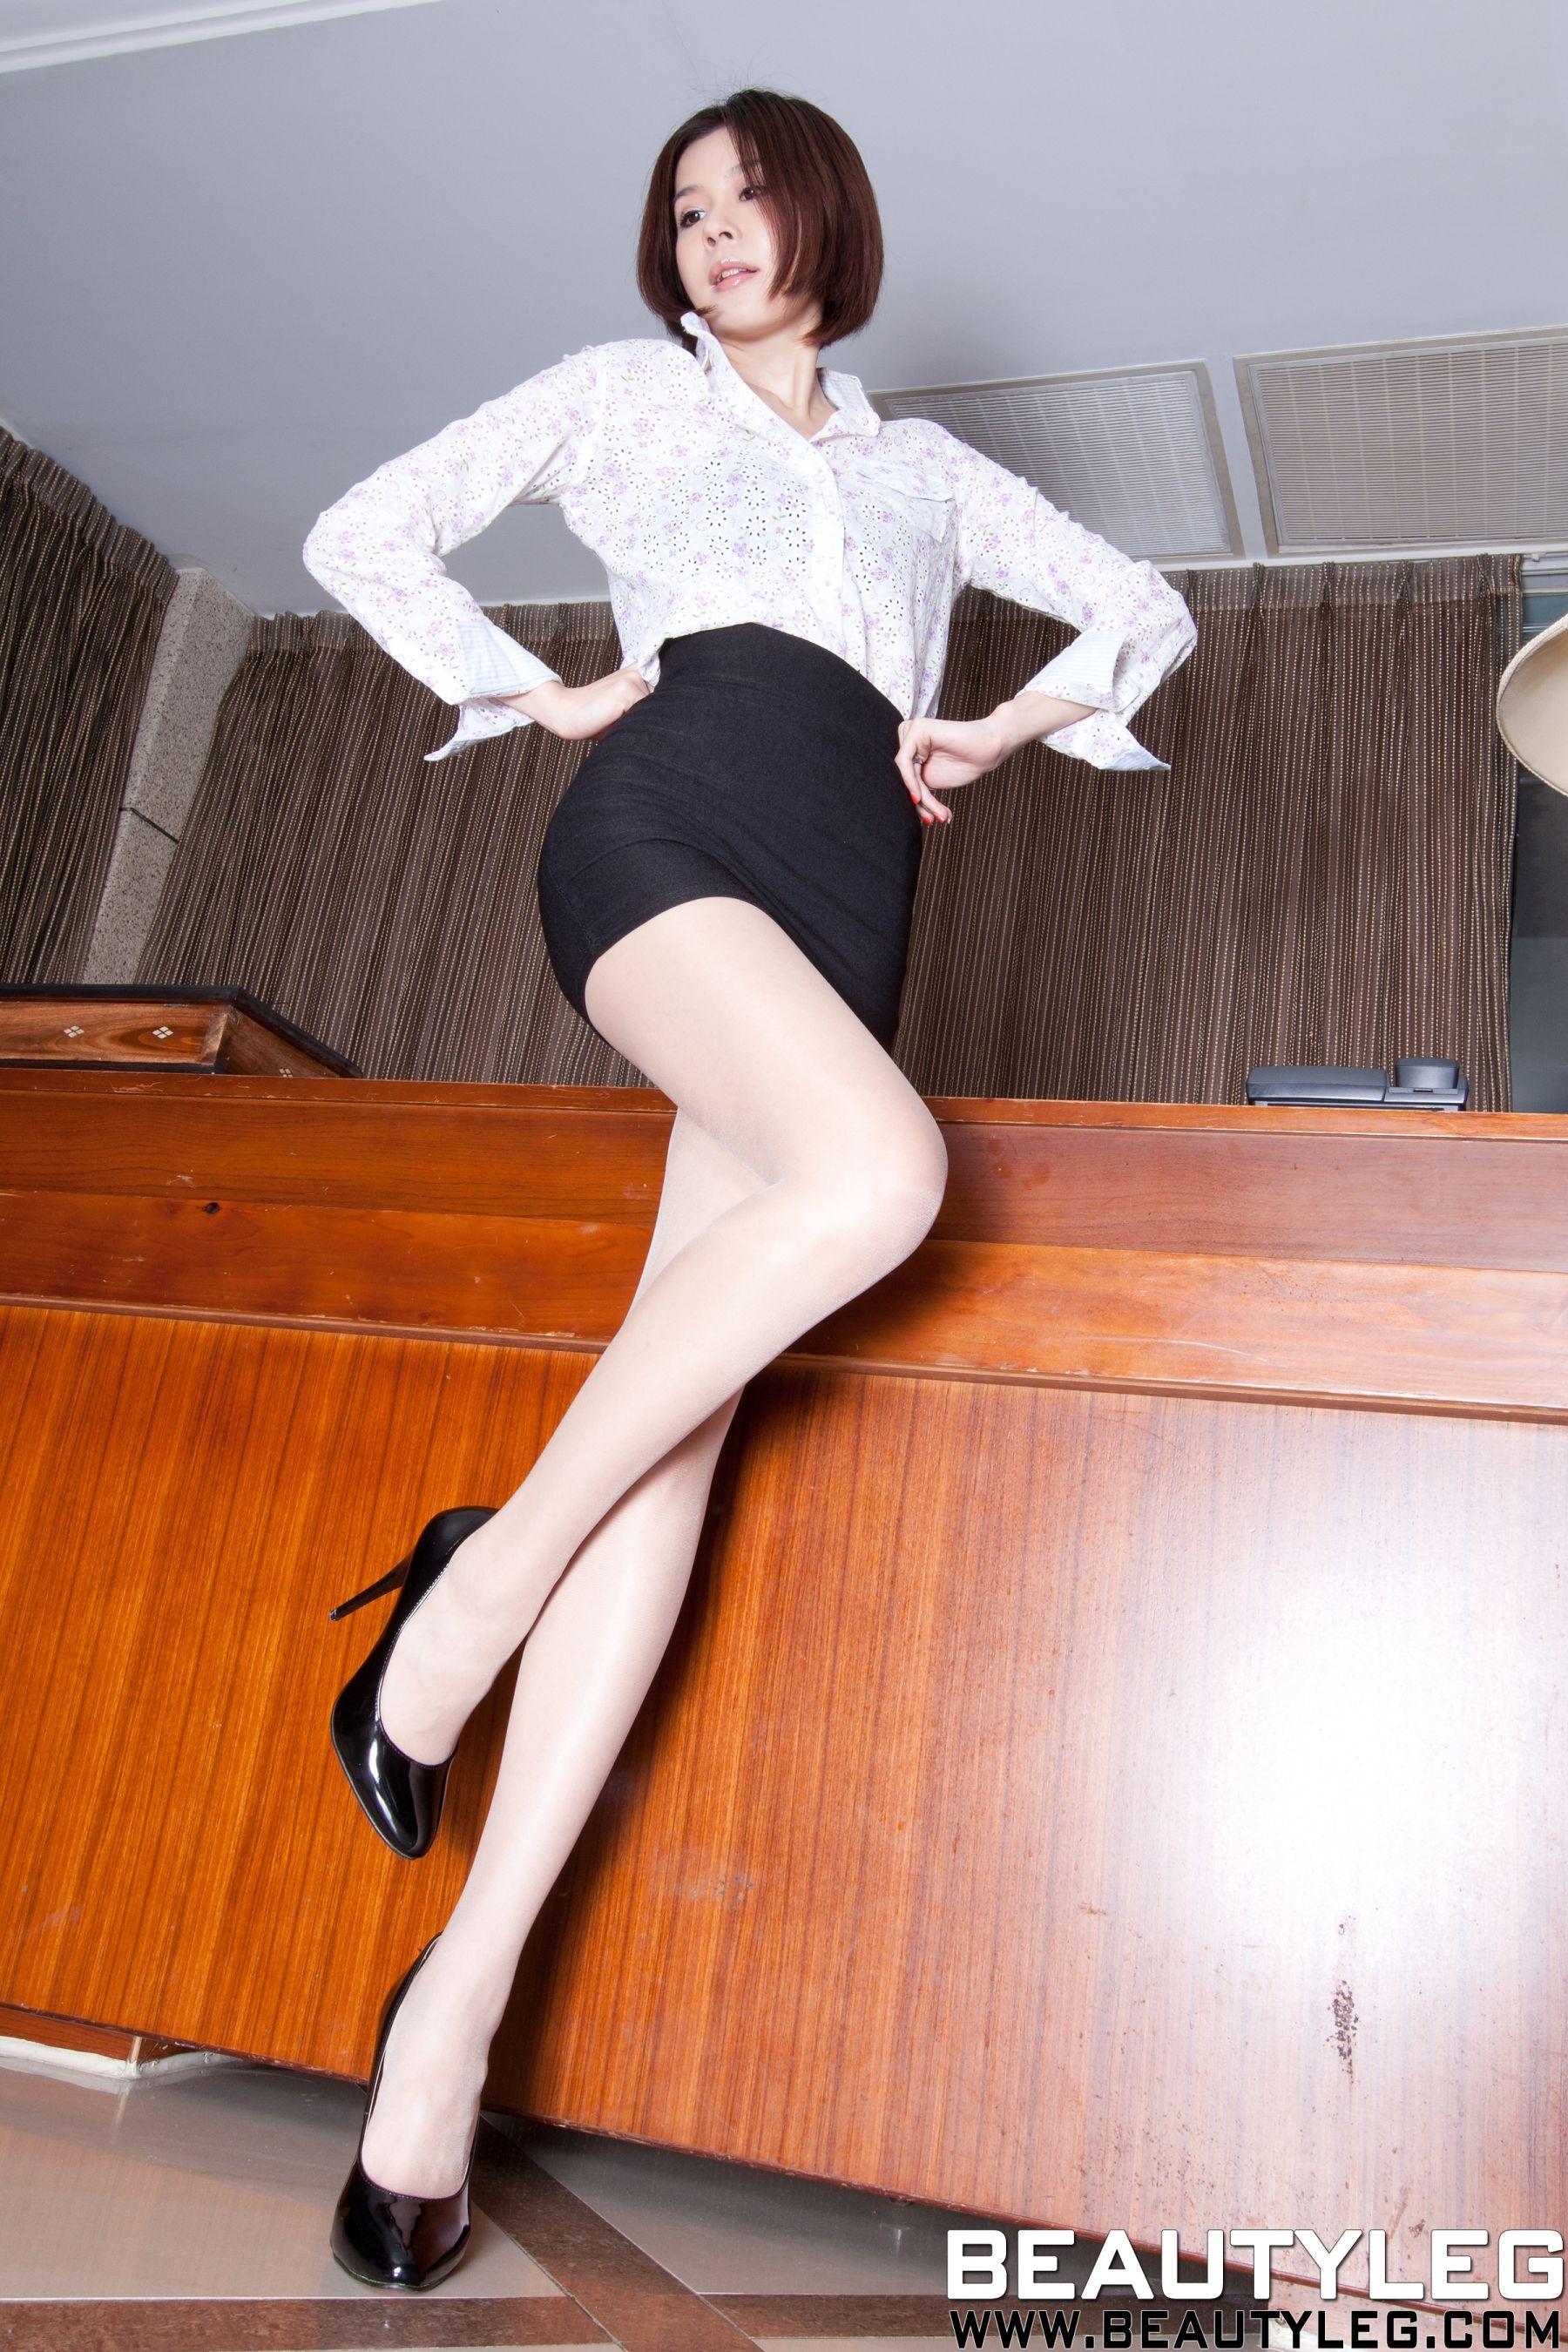 VOL.21 [Beautyleg]短发高跟美腿:腿模Sarah高品质写真套图(70P)